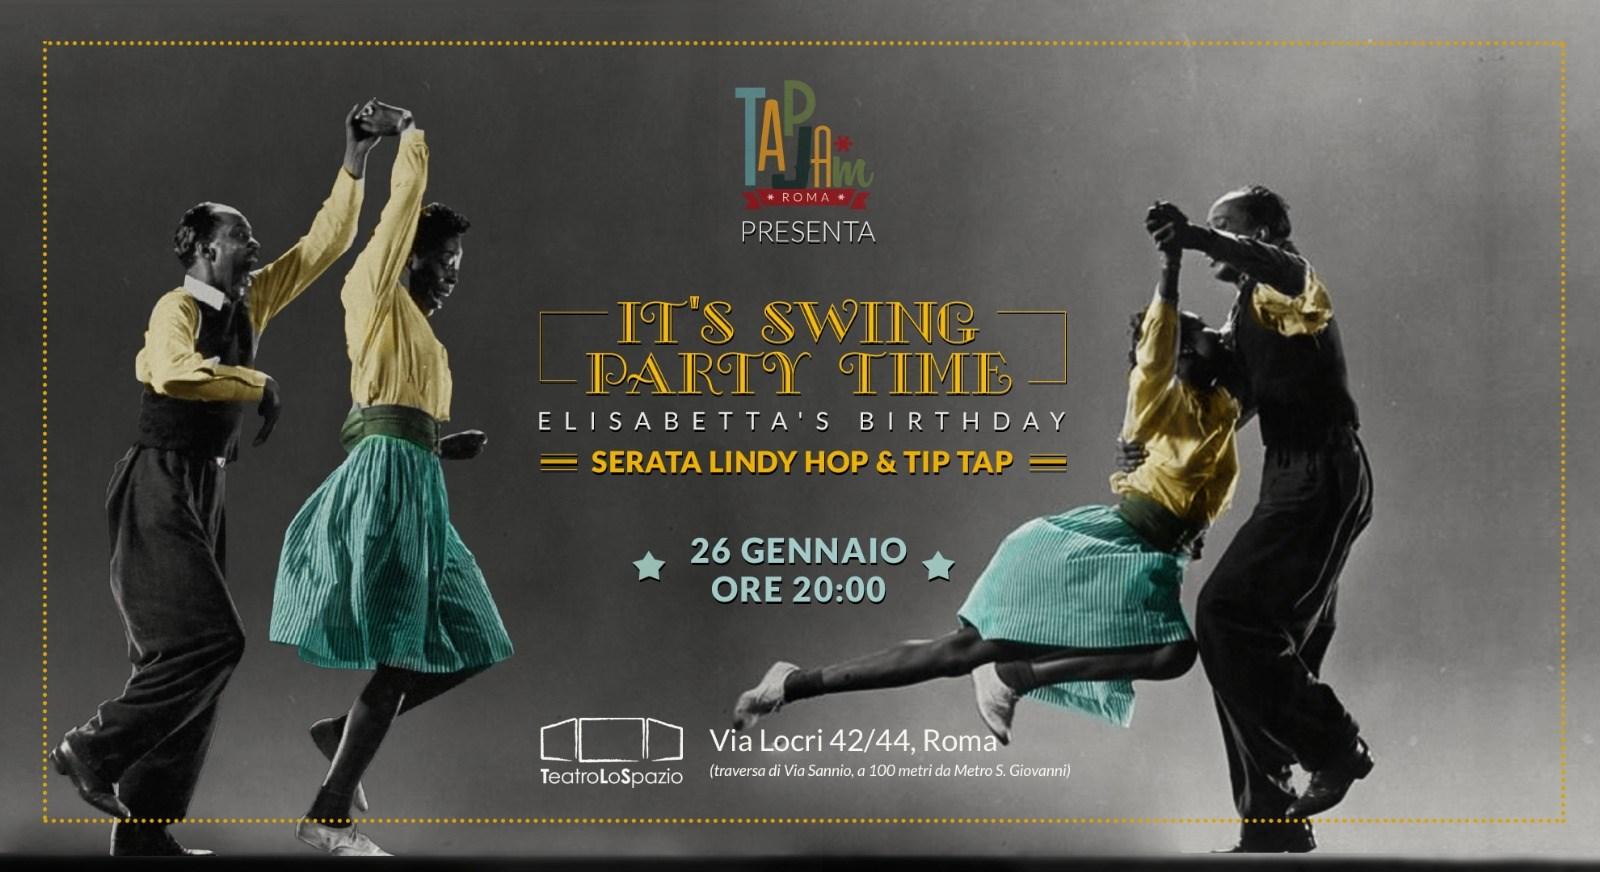 TapJam - TeatroLoSpazio - 26 gennaio 2020 - Via Locri 42 00183 - Roma